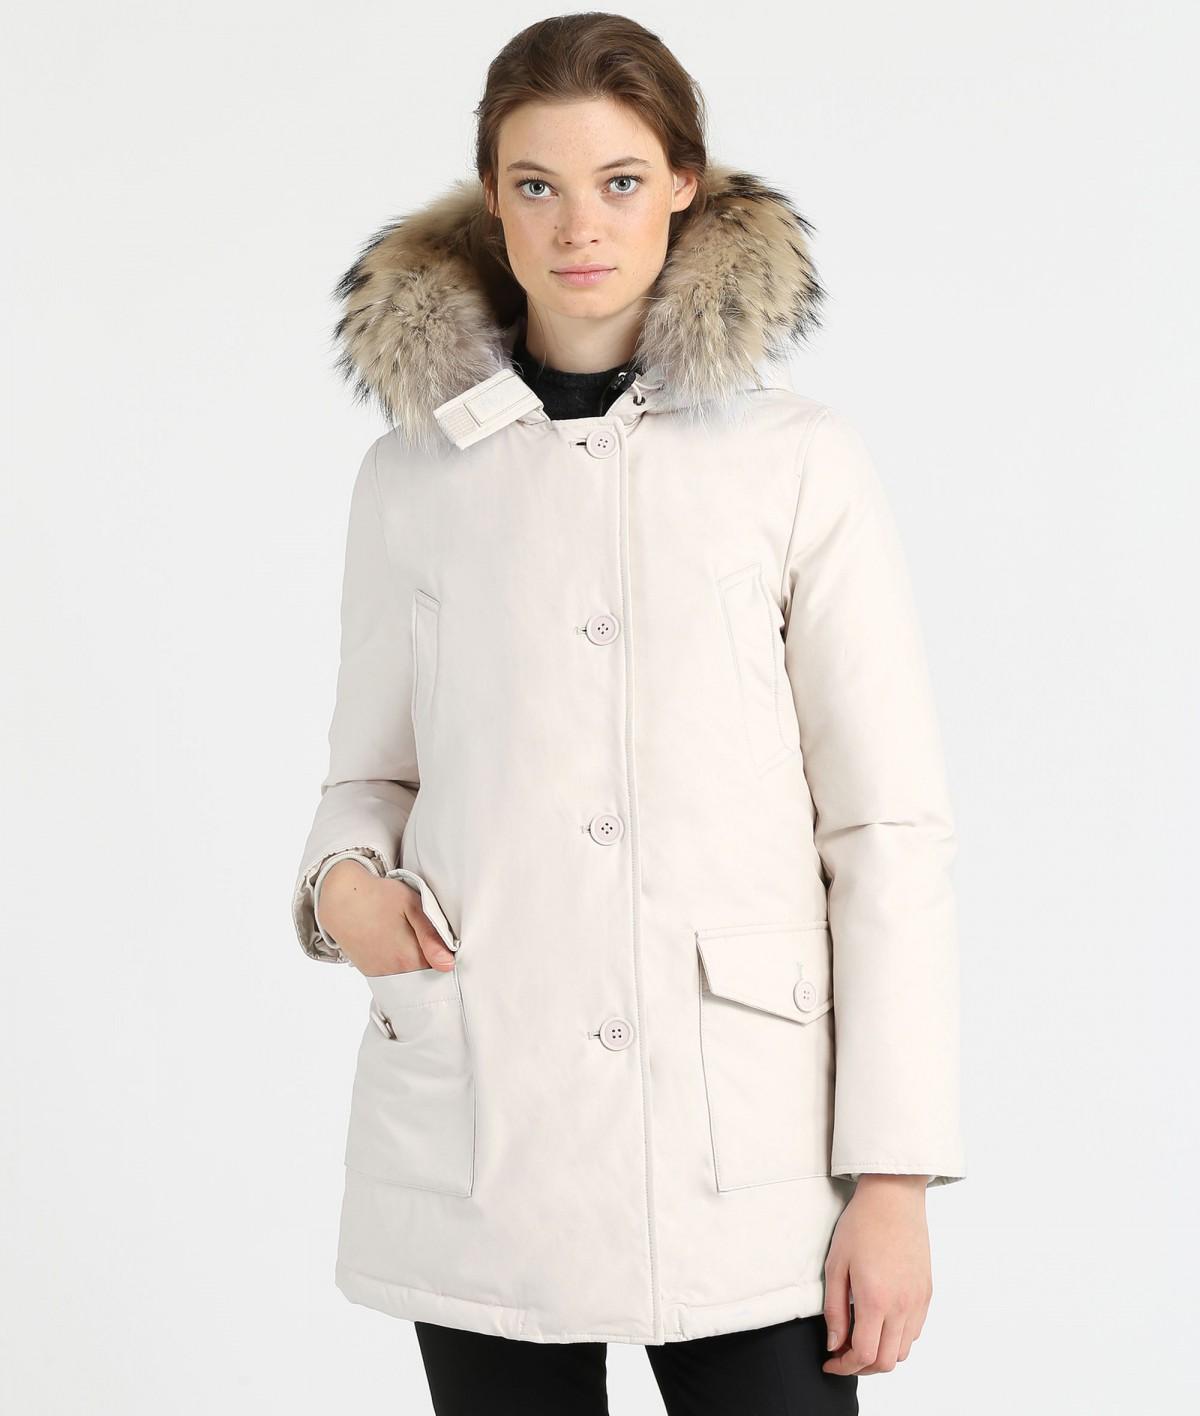 Woolrich Arctic Parka Dames WitRoze Maat S